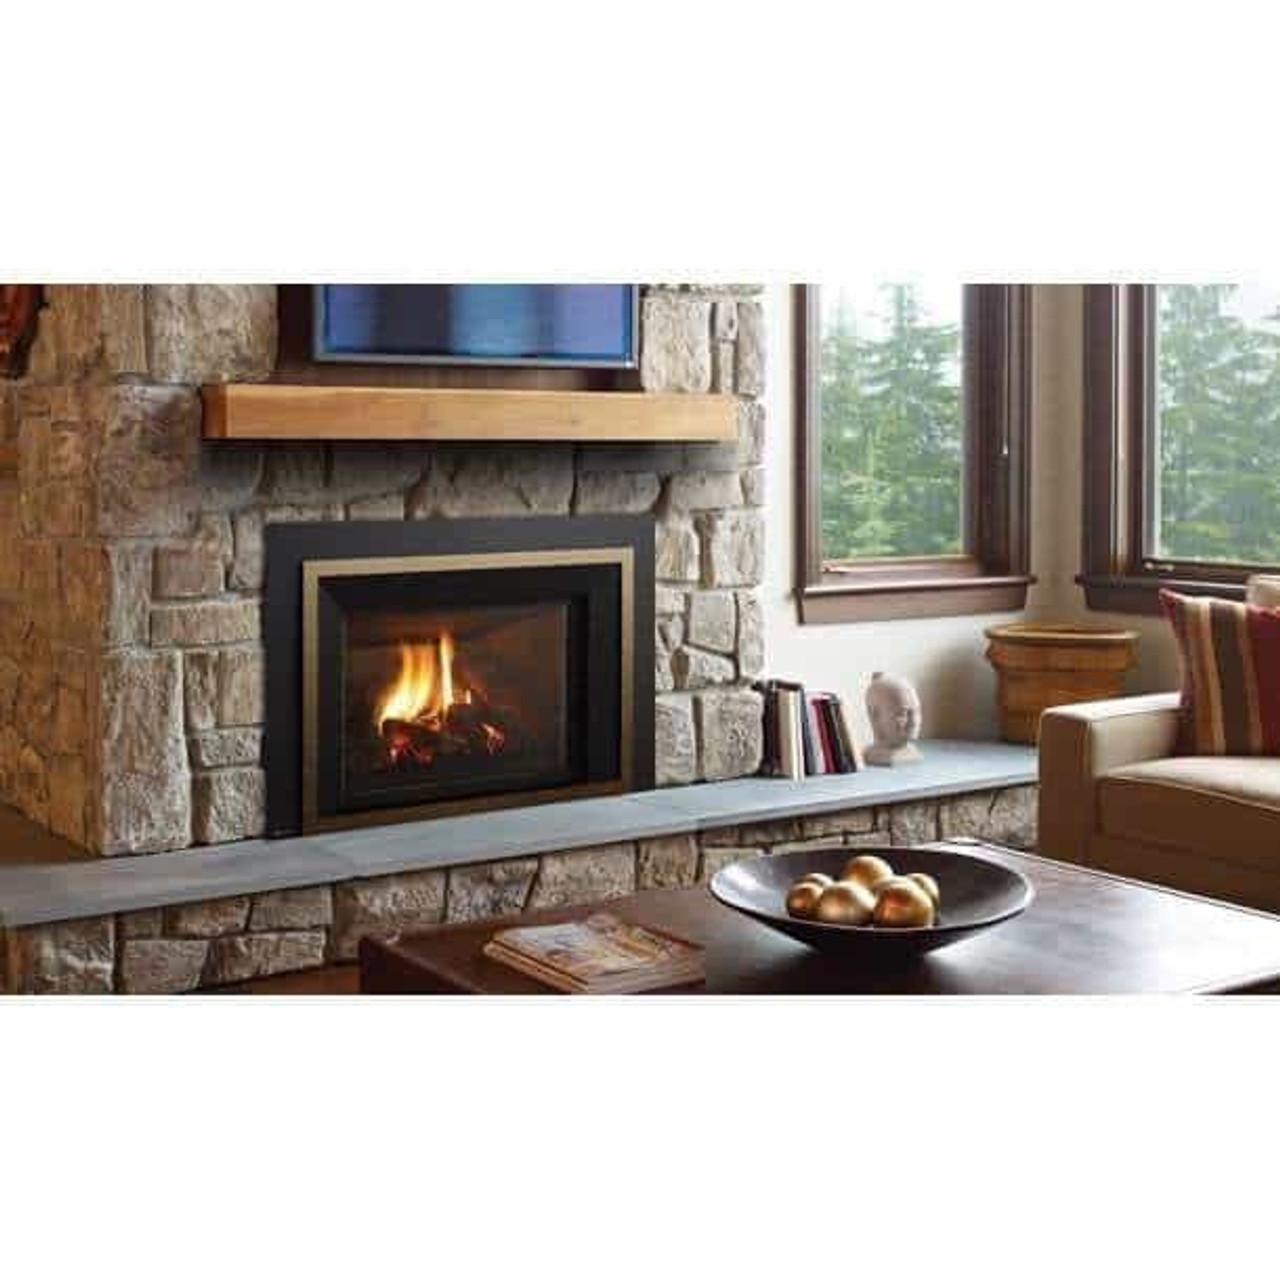 296 018 Flue Adaptor Assembly Gasket Ams Fireplace